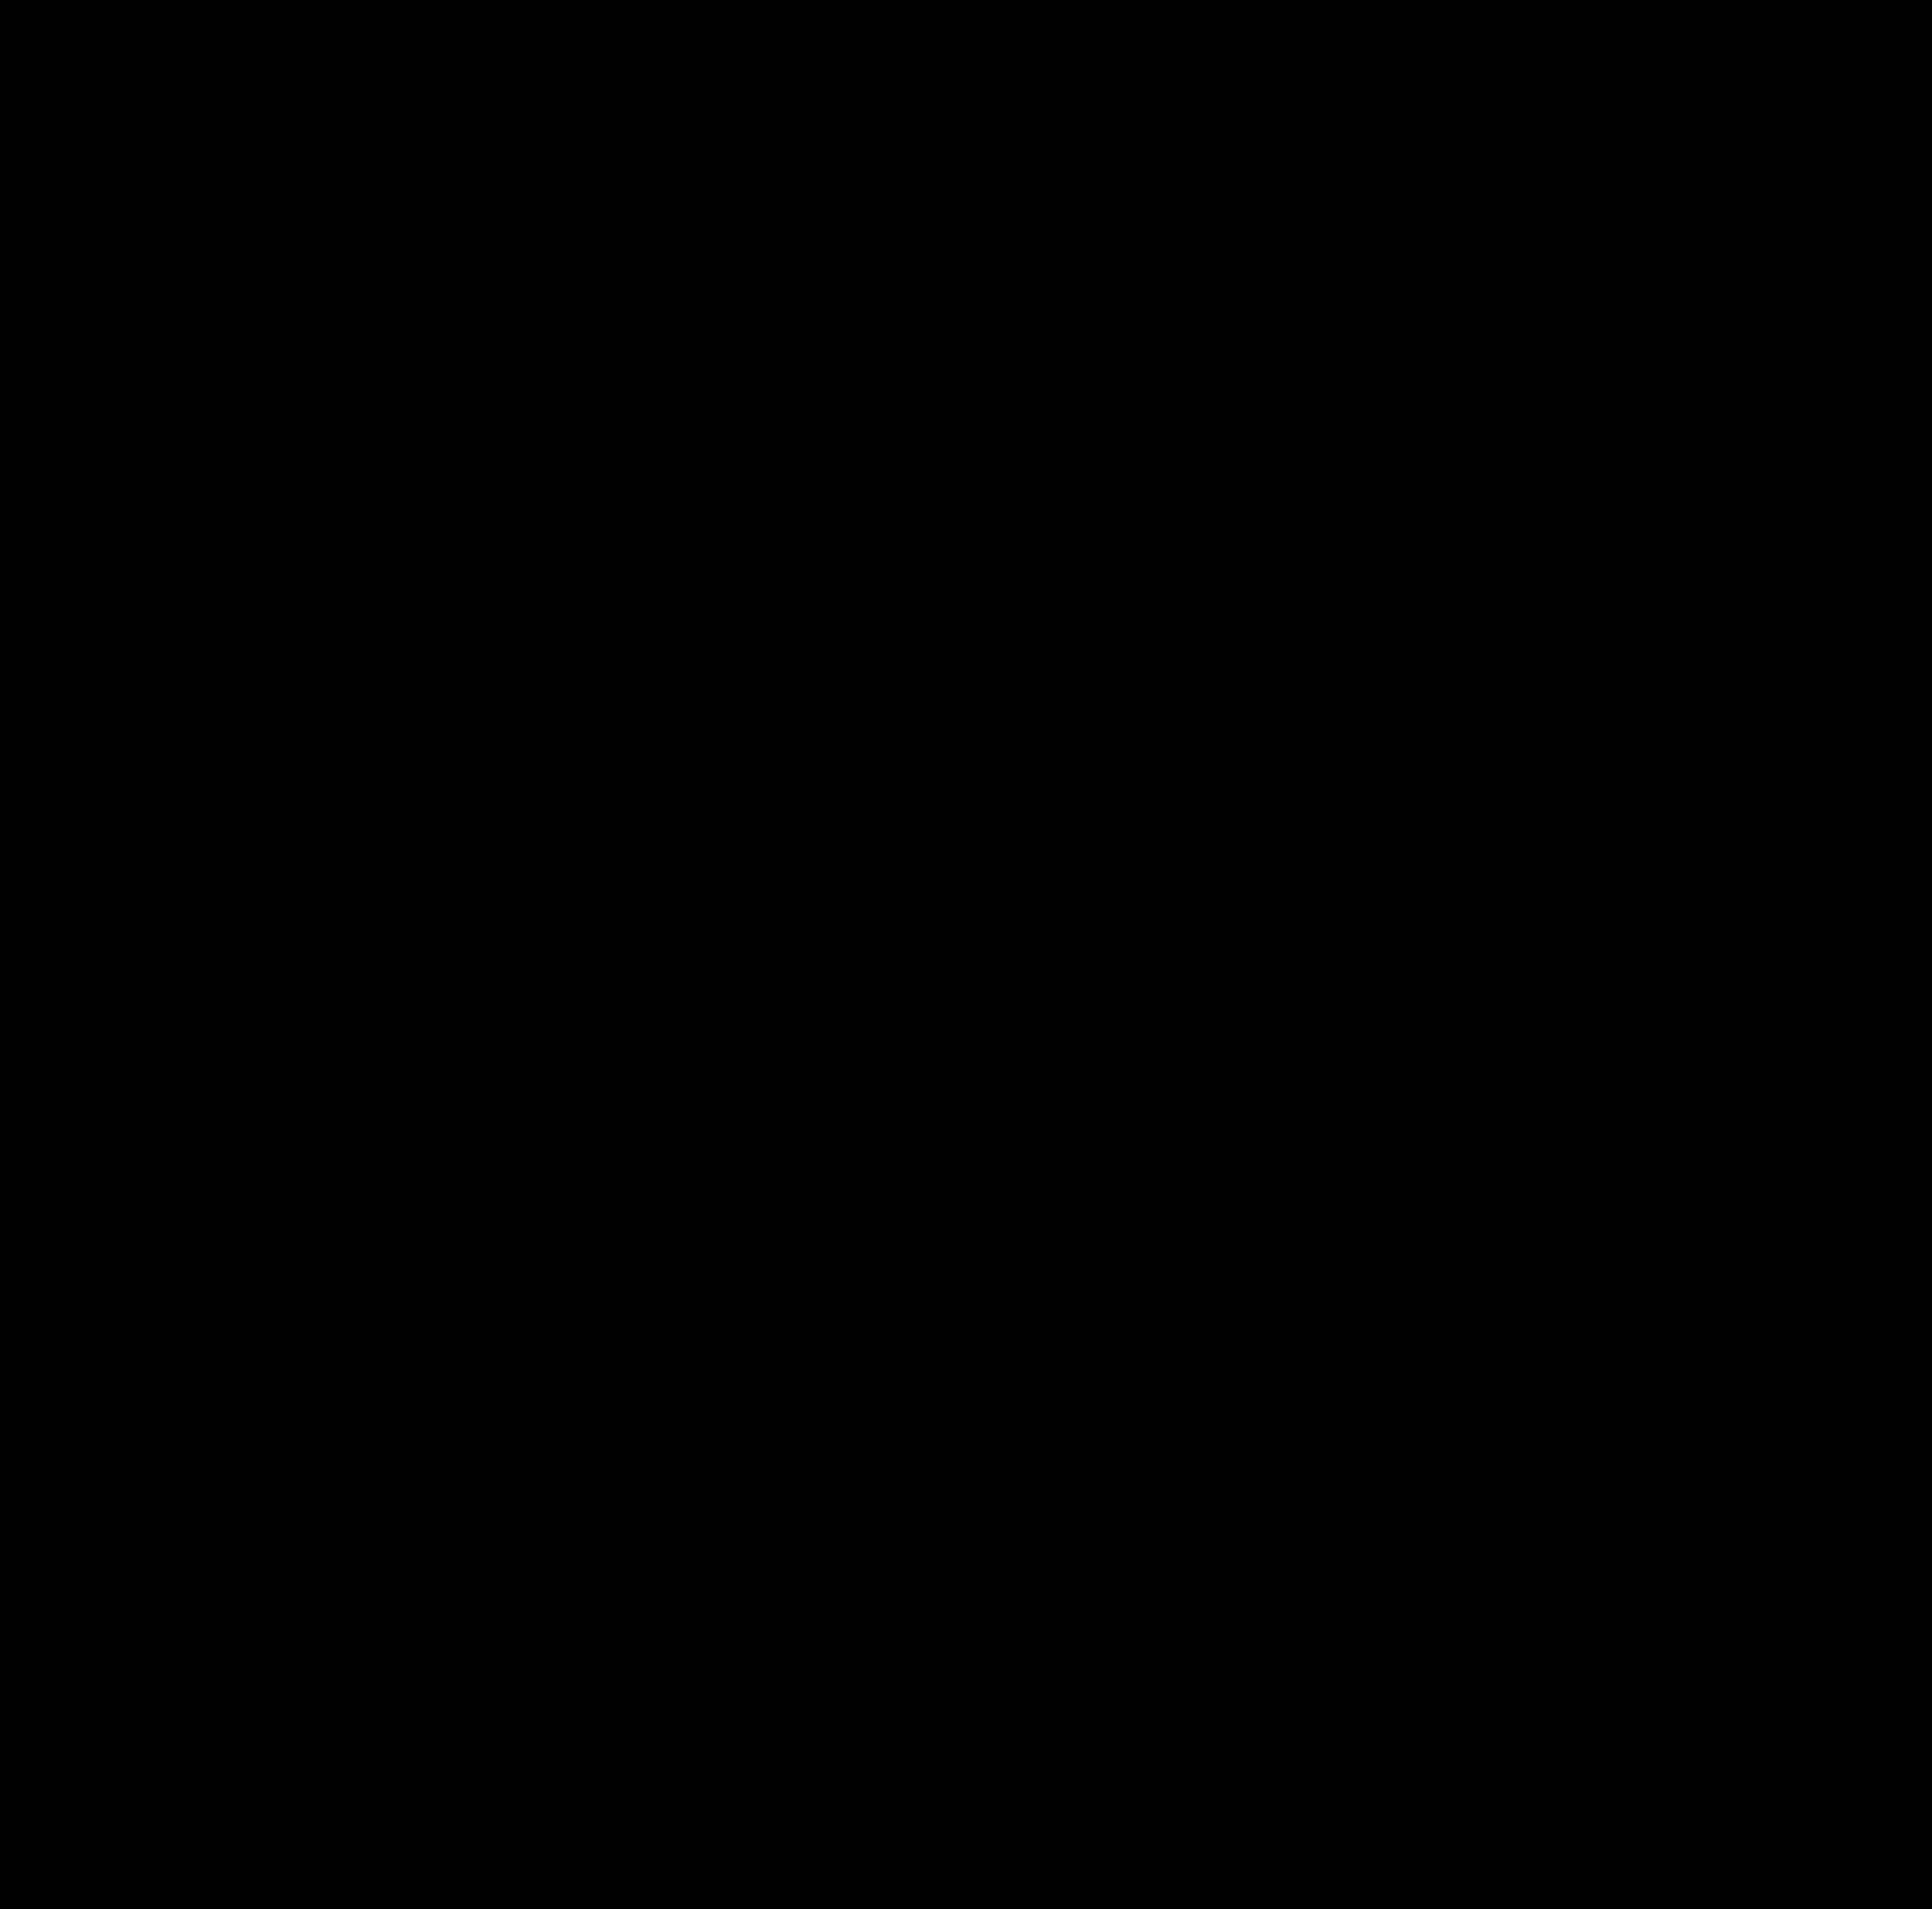 Crossed swords big image. Clipart sword logo